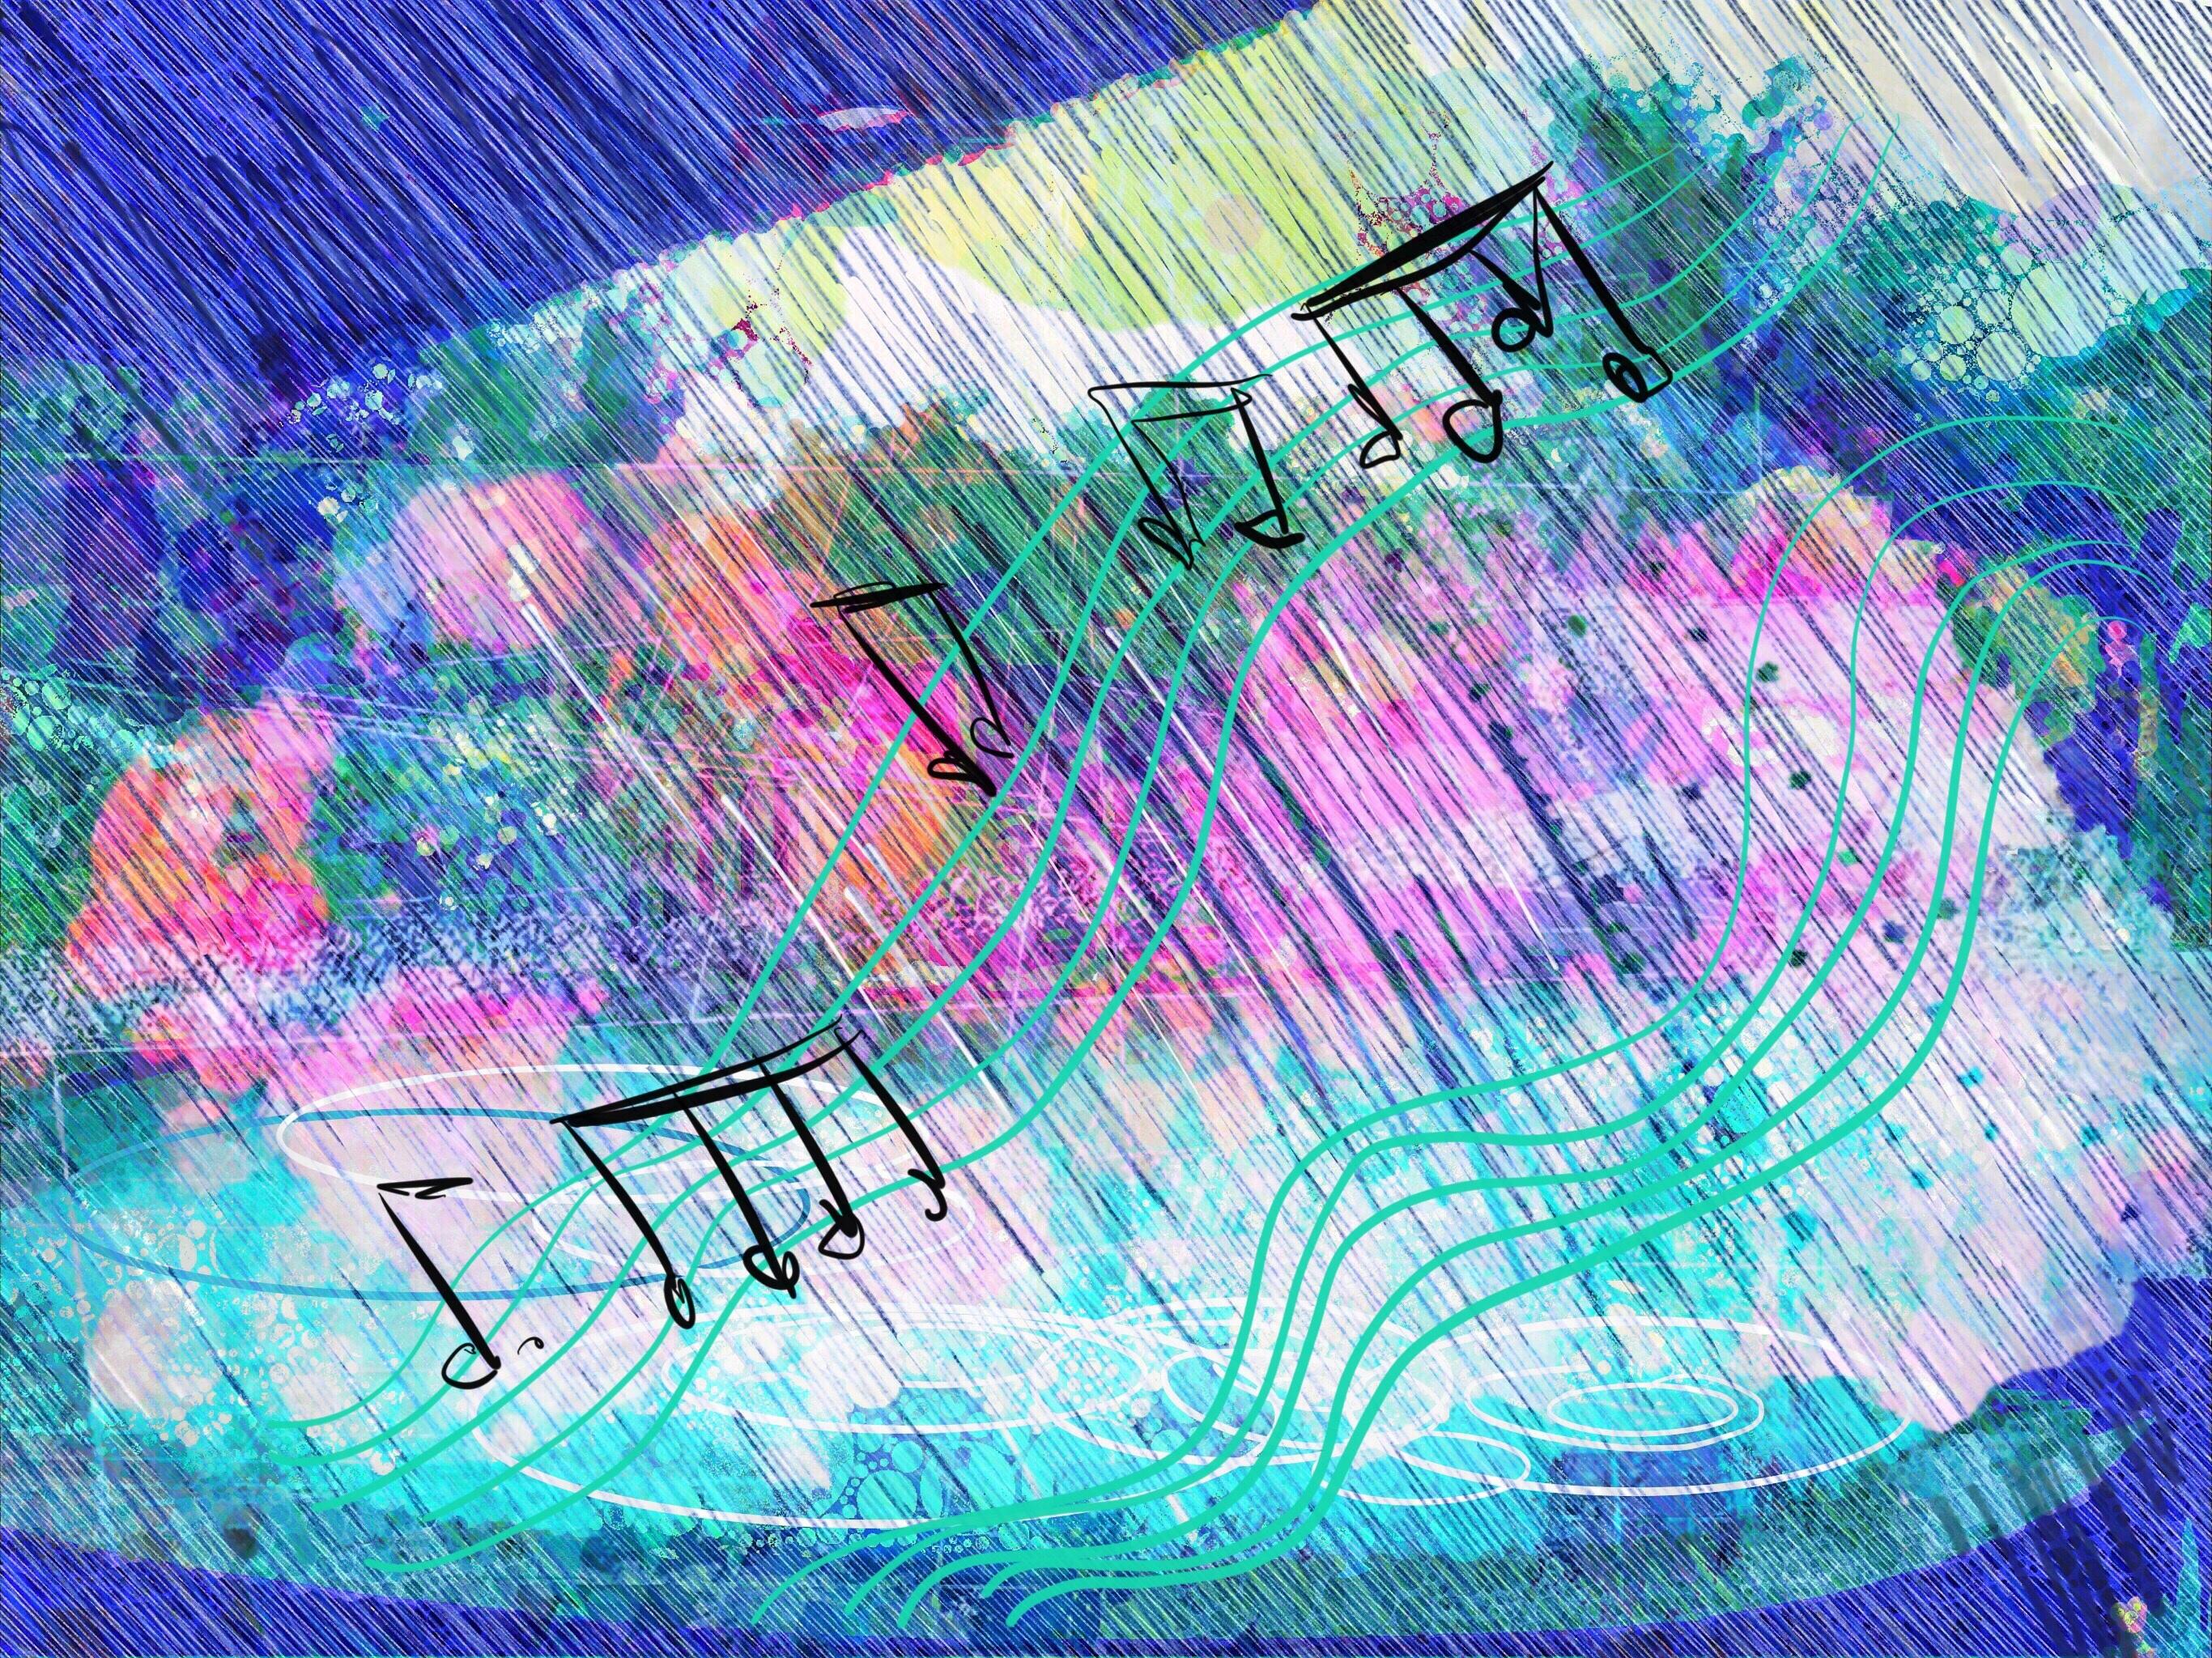 Gambar Musik Perjalanan Pola Garis Warna Biru Lingkaran